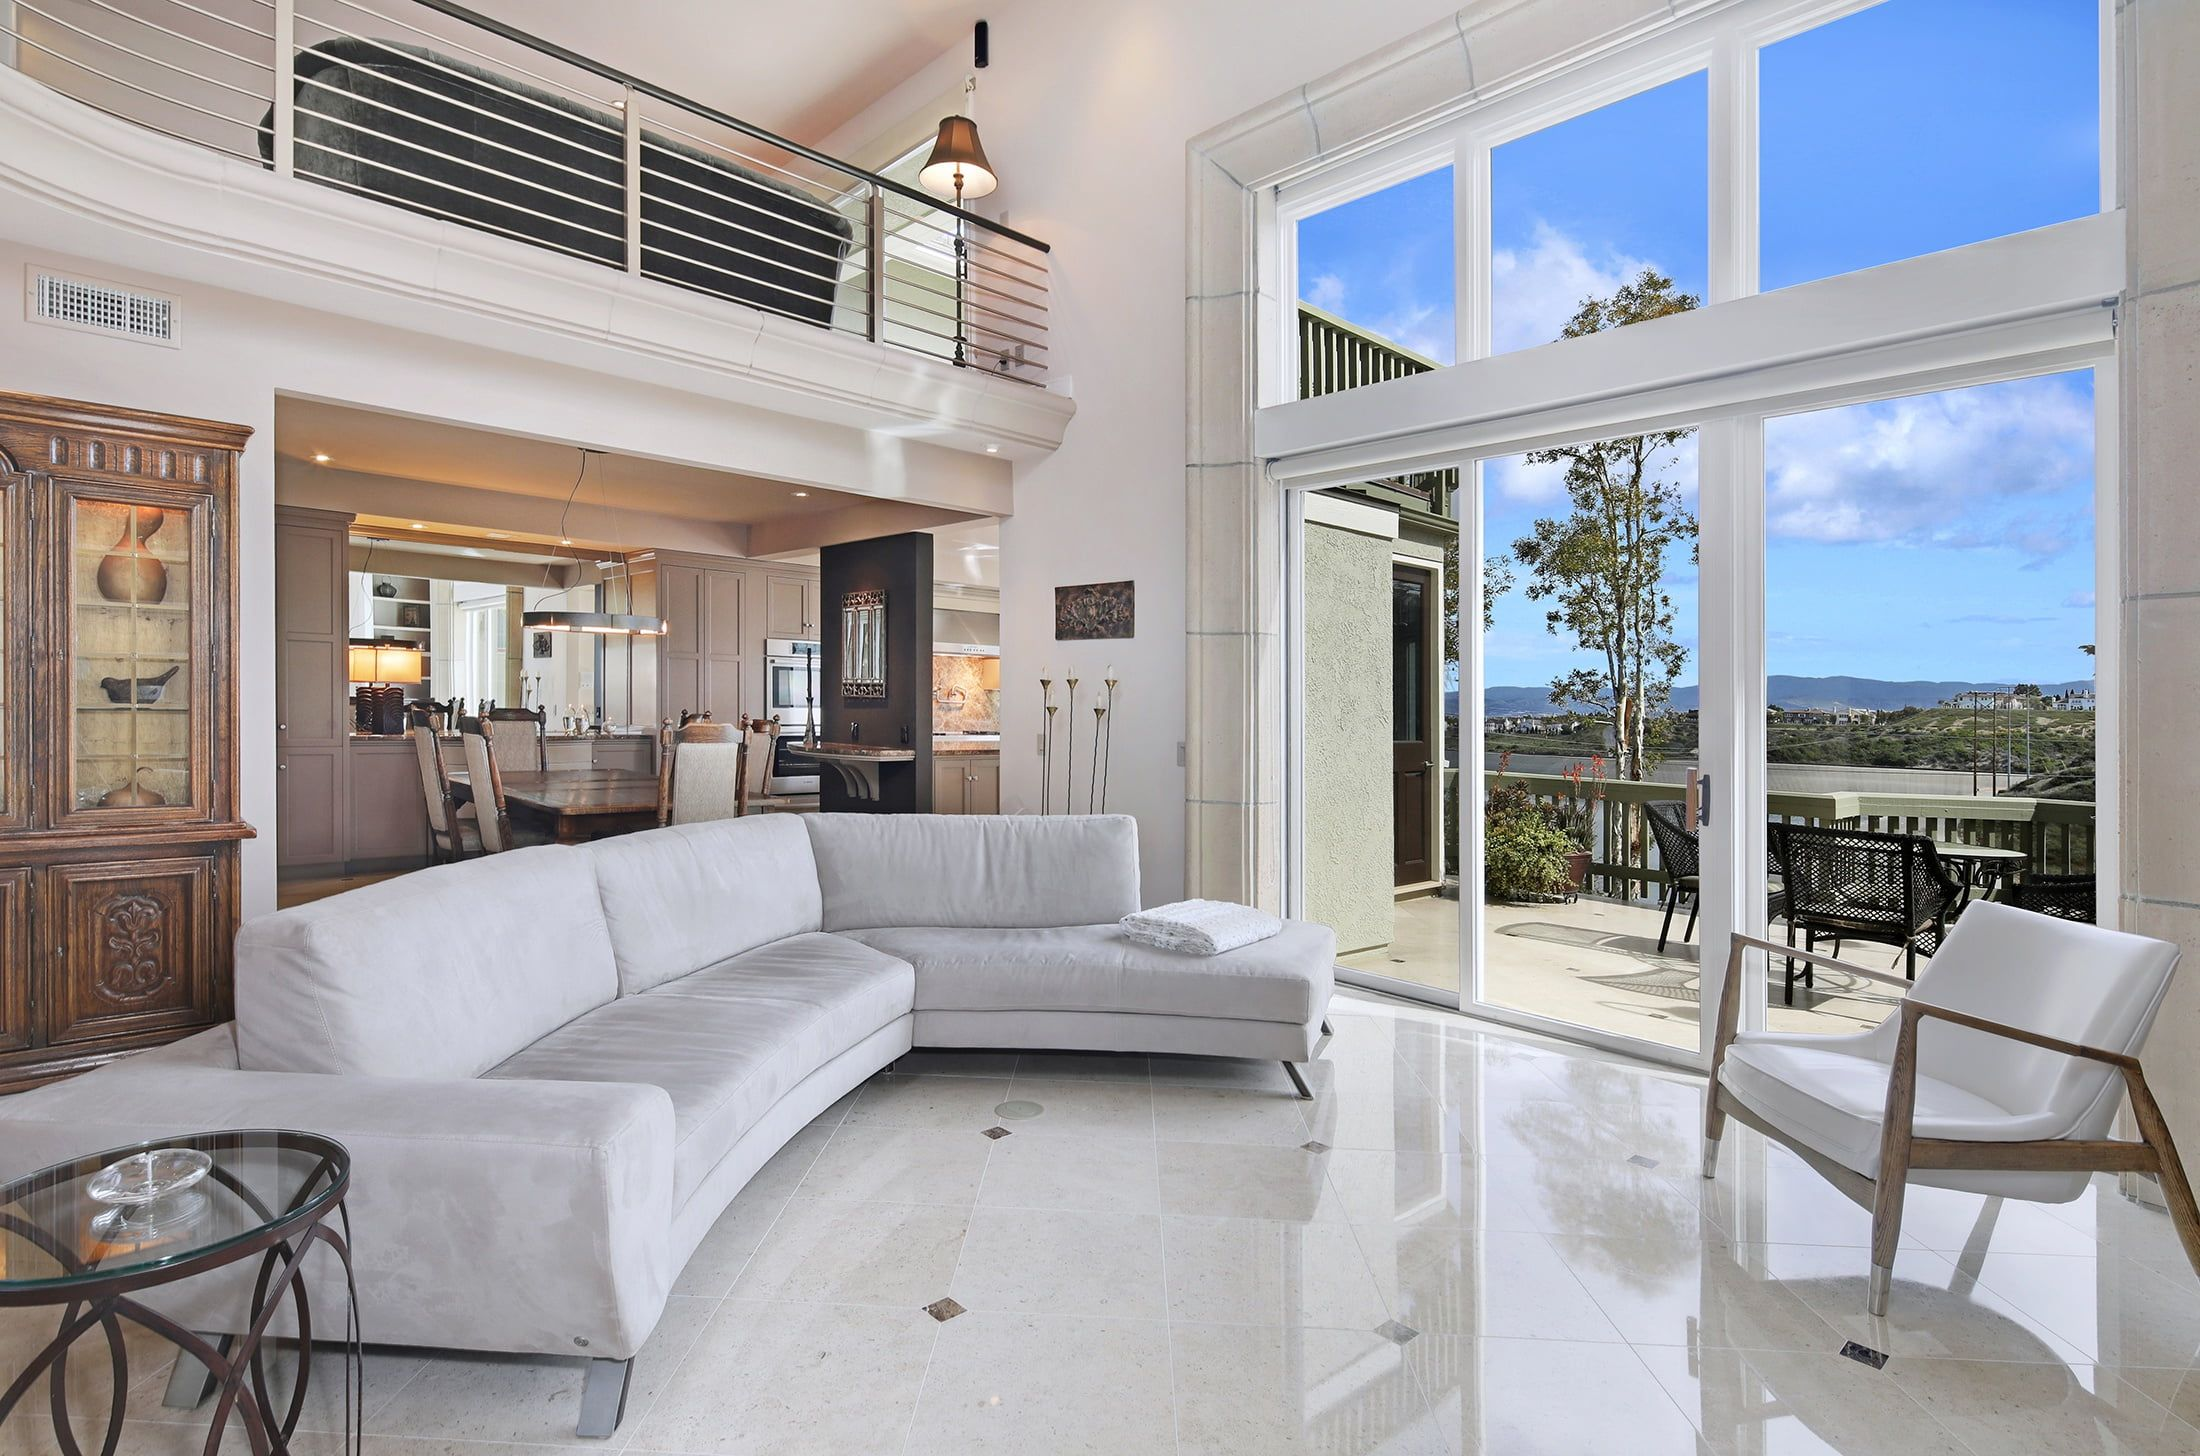 Sofa View Mansion Living Room 1080p Wallpaper Hdwallpaper Desktop Mansion Living Room Mansion Living Living Room Pictures Living room hd pictures